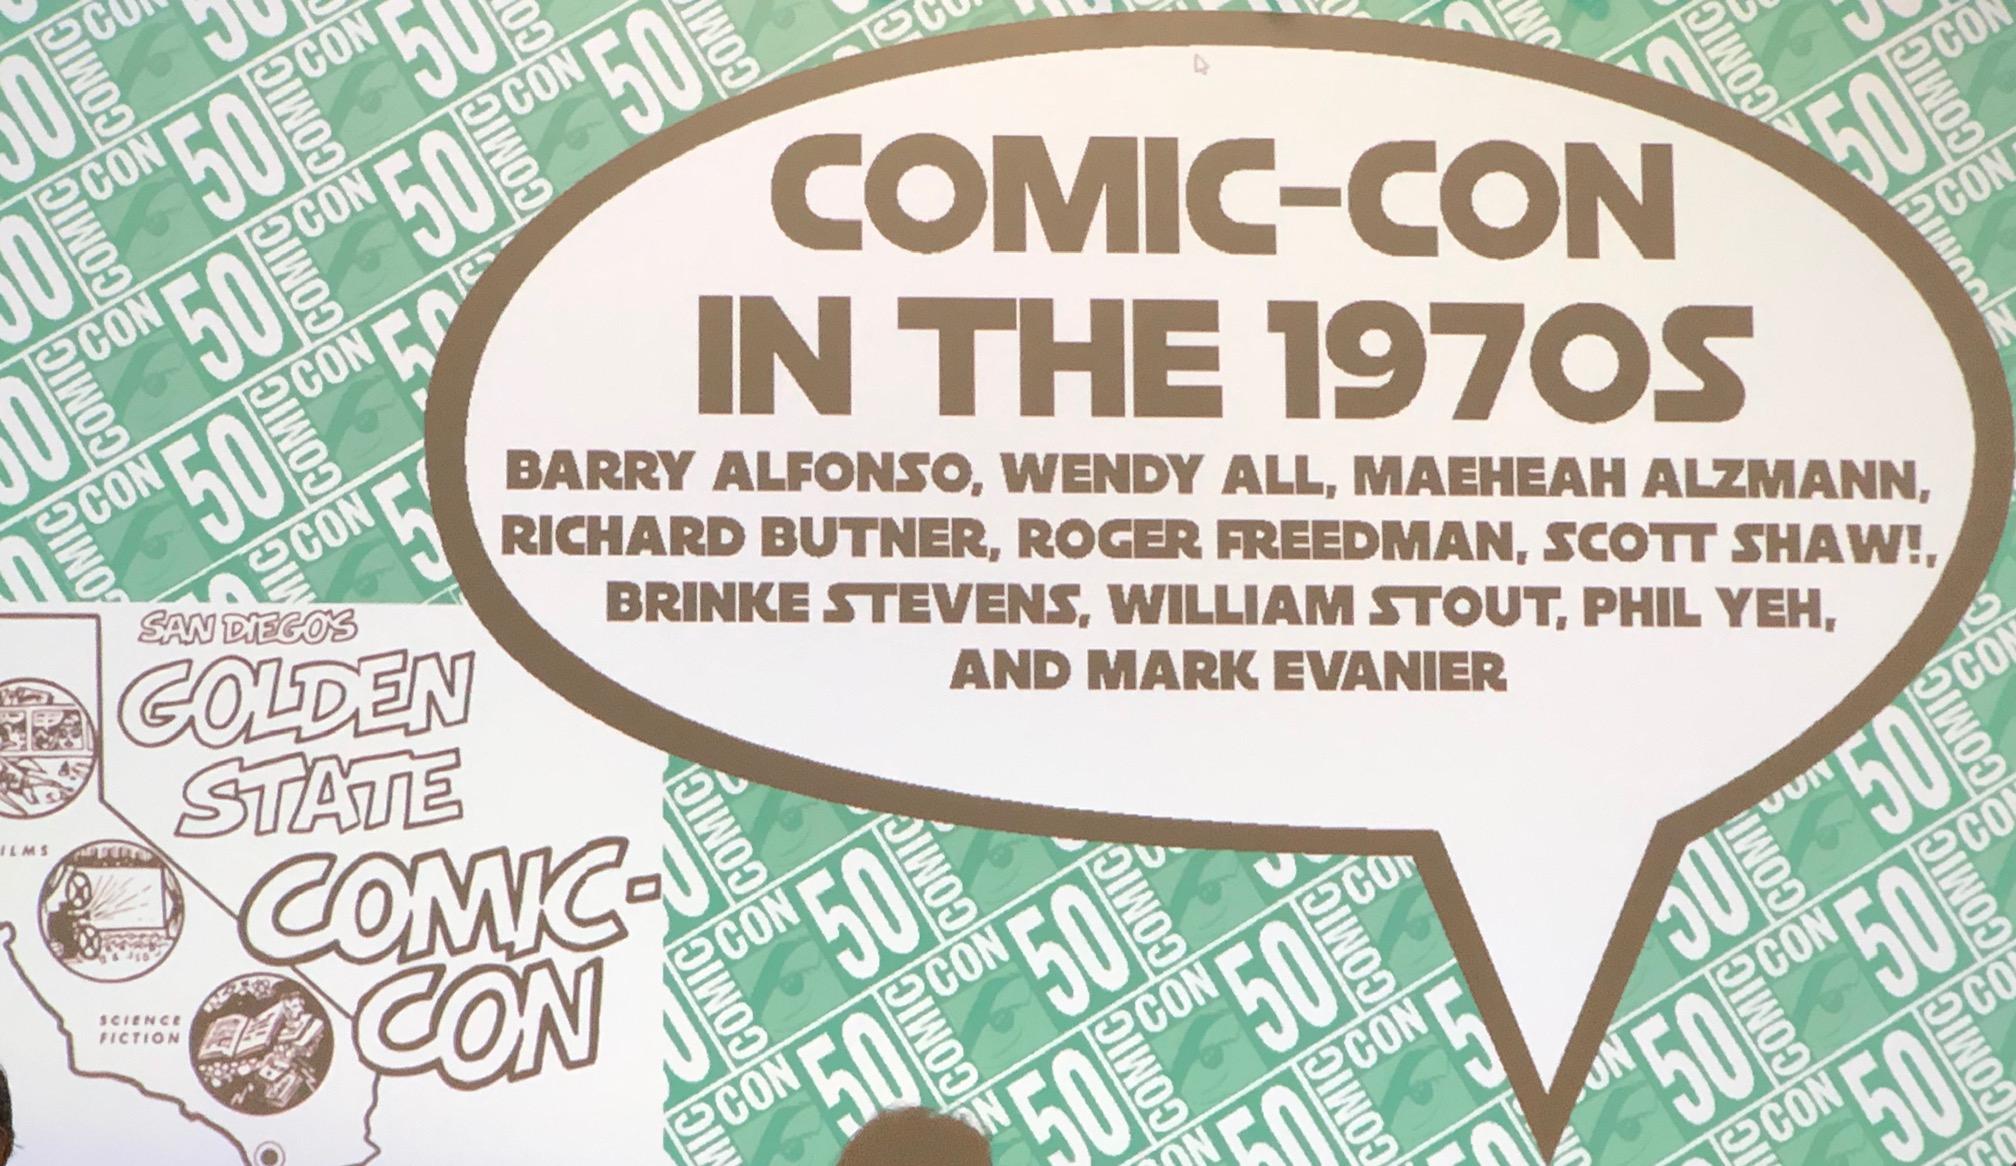 Comic-Con In the '70s panel